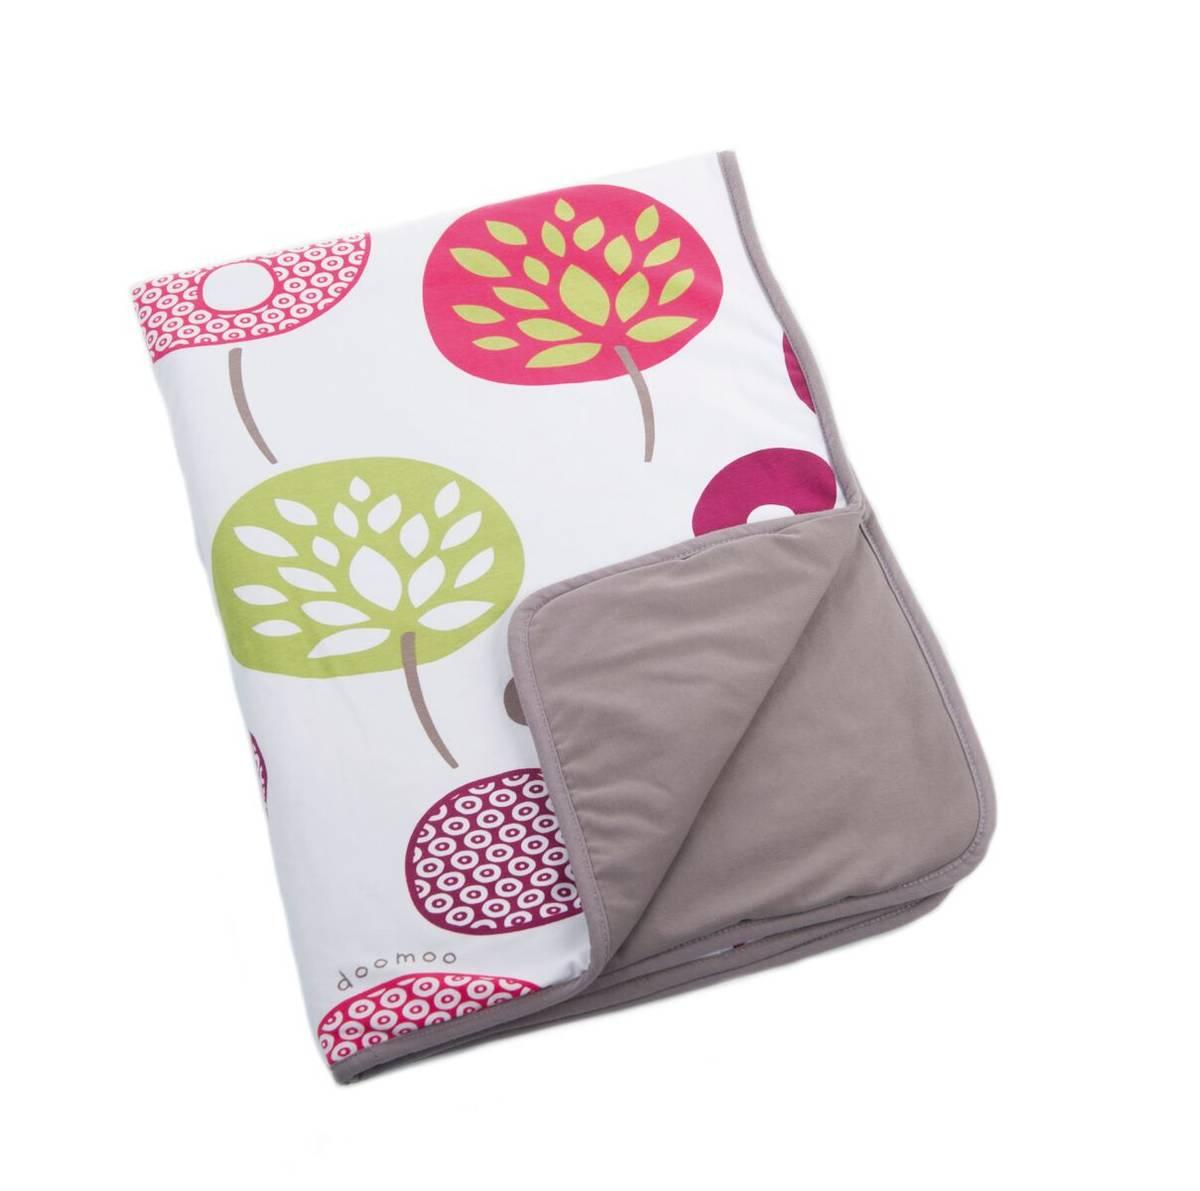 Tree Berry - Viltit ja huovat - 6259840001 - 2